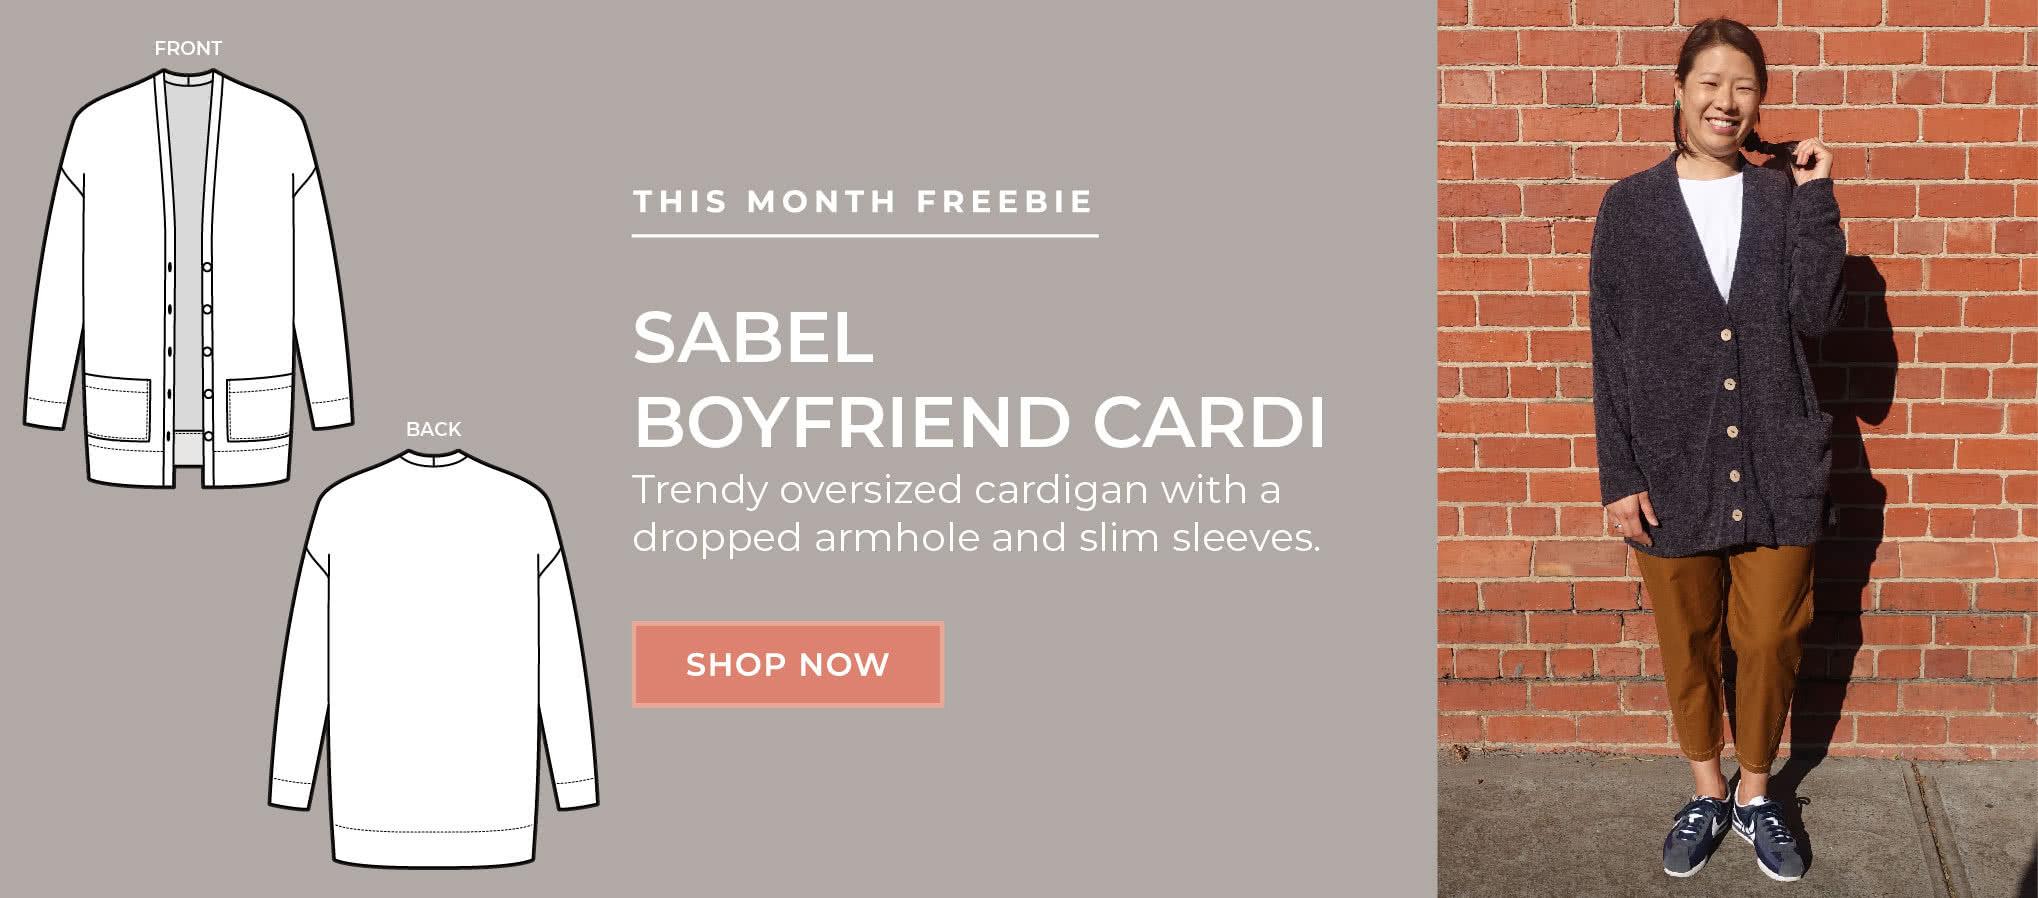 July 2020 Freebie - Sabel Boyfriend Cardi